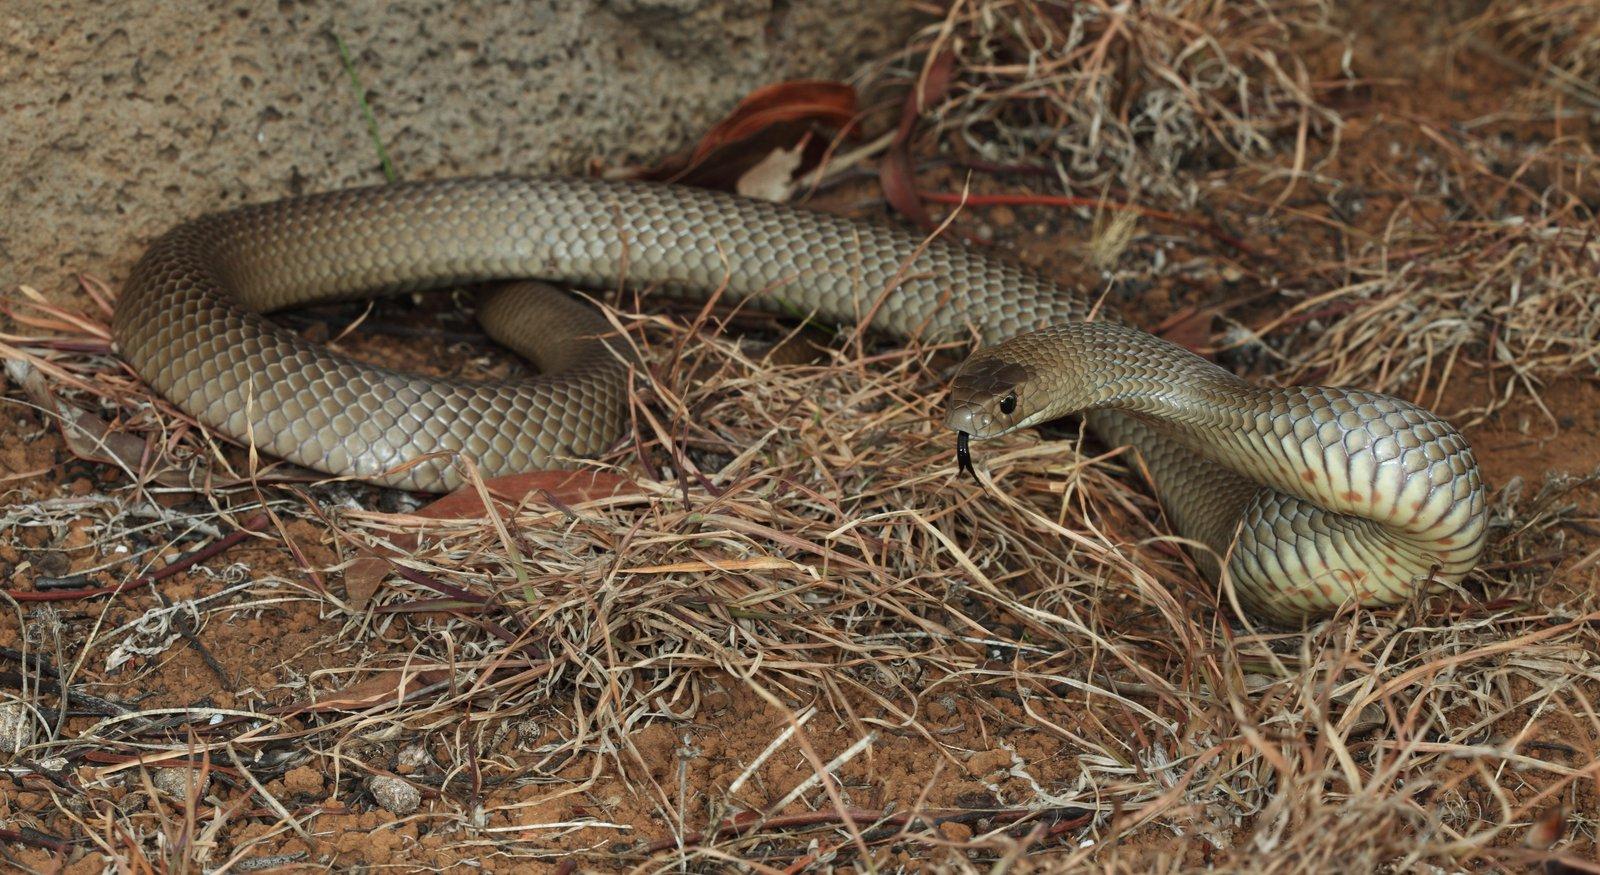 Eastern Brown Snake - The Australian Museum